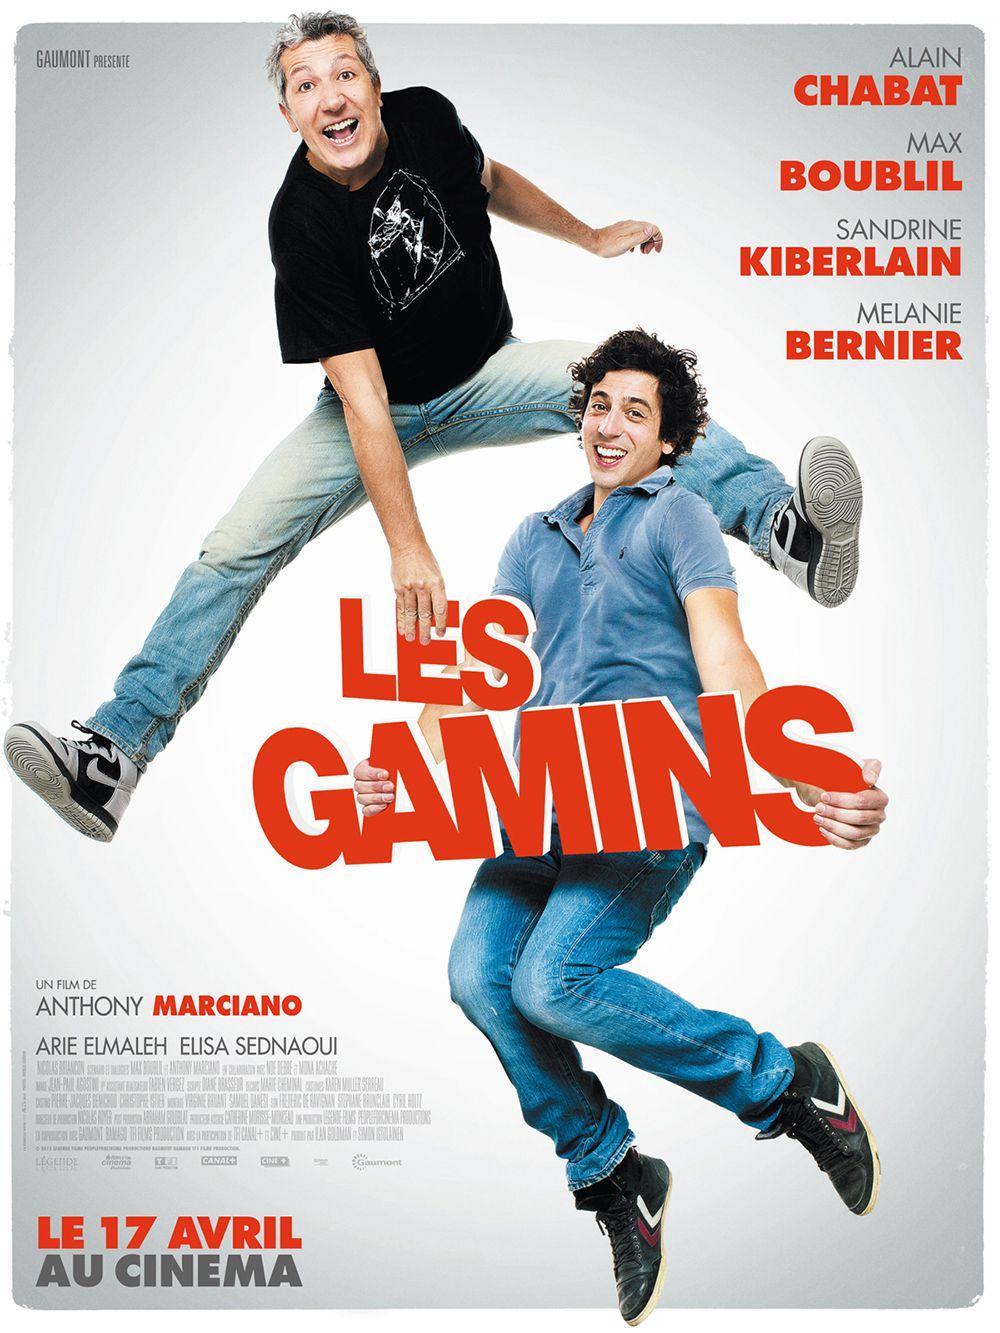 Les Gamins - Film (2013)